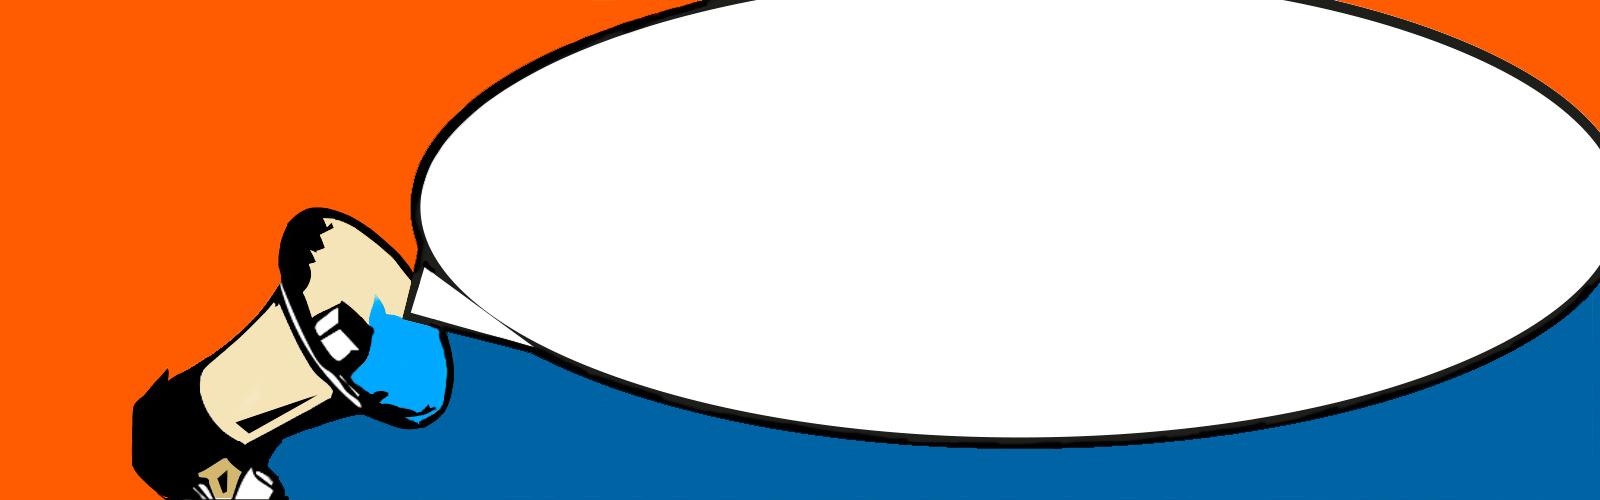 slidergestionpng8